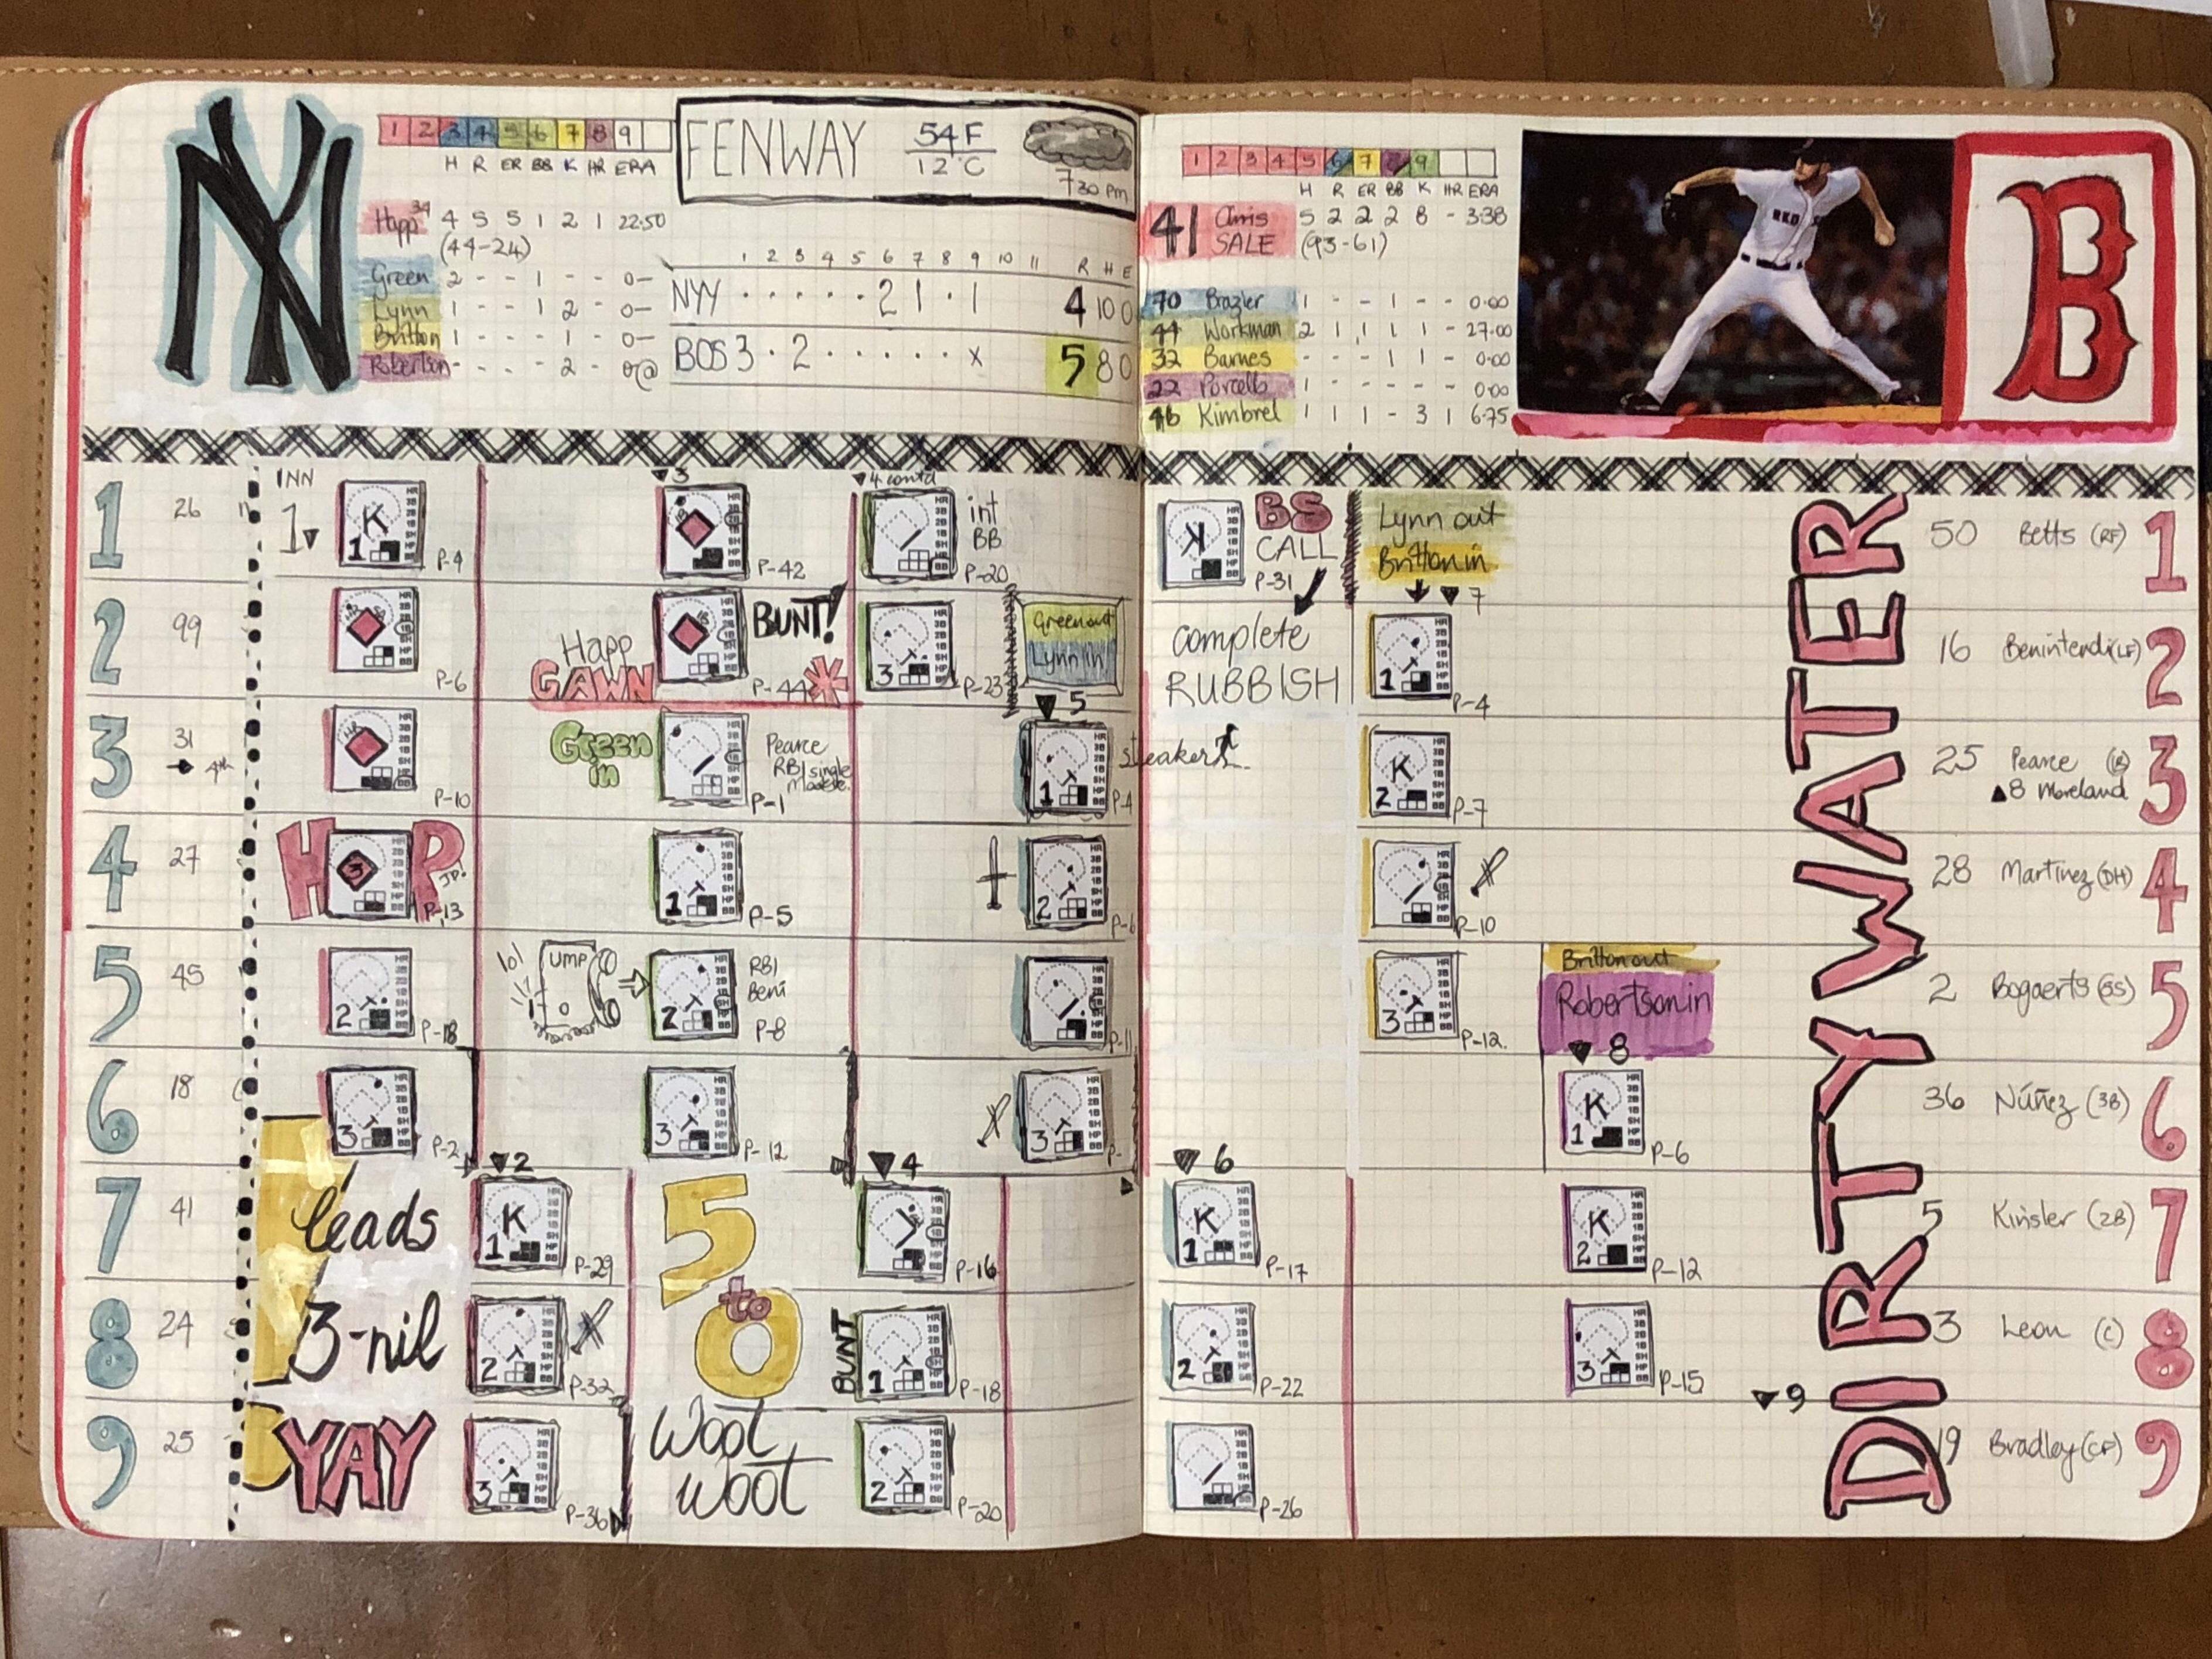 Red Sox v Yankees game 1 ALDS 2018 score notes | laurenetrim